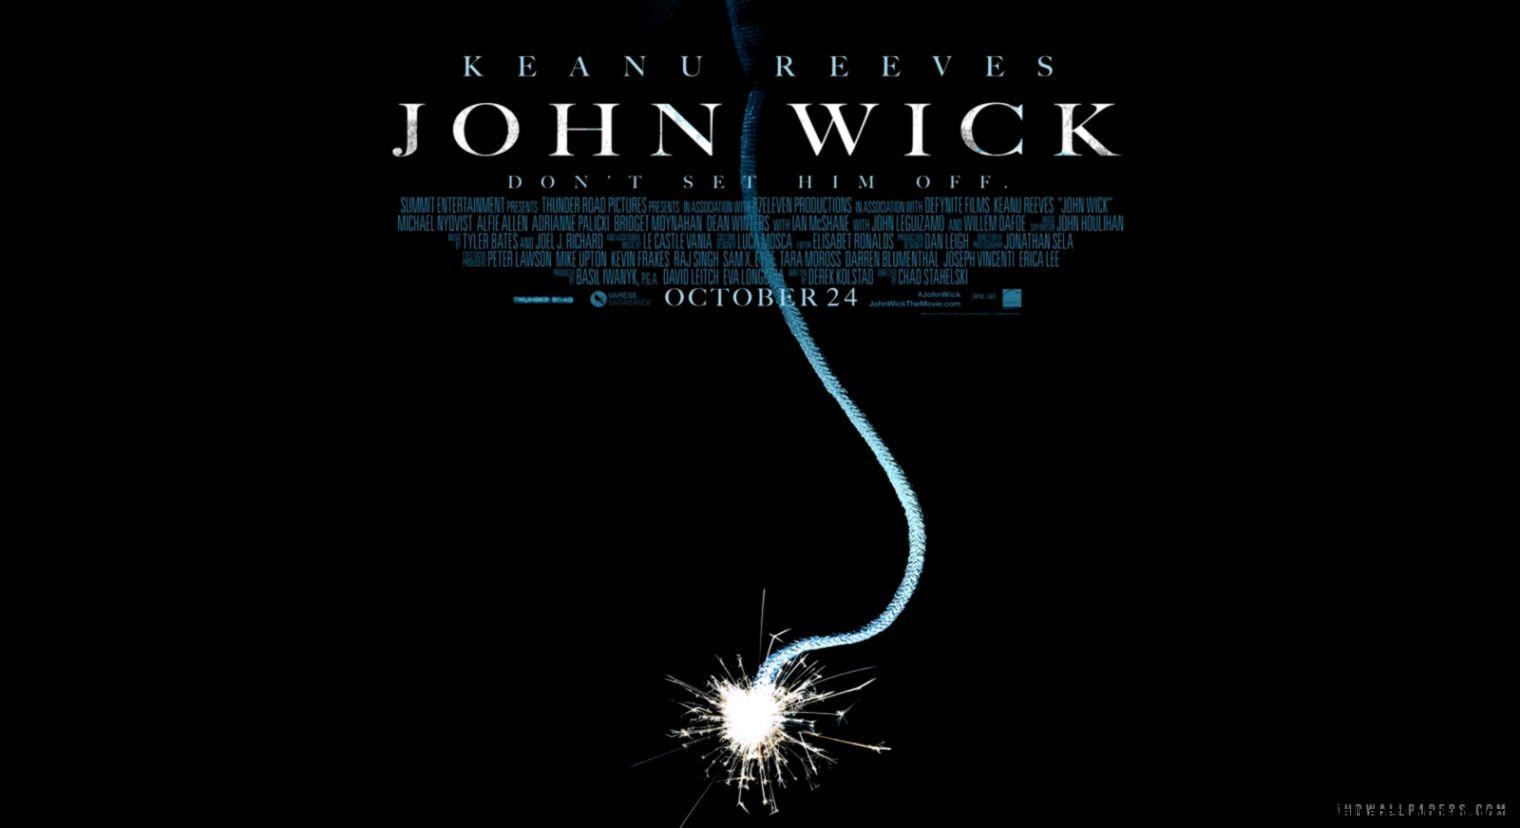 John Wick 2014   The Bomb   Wallpaper 003   Movie Smack Talk